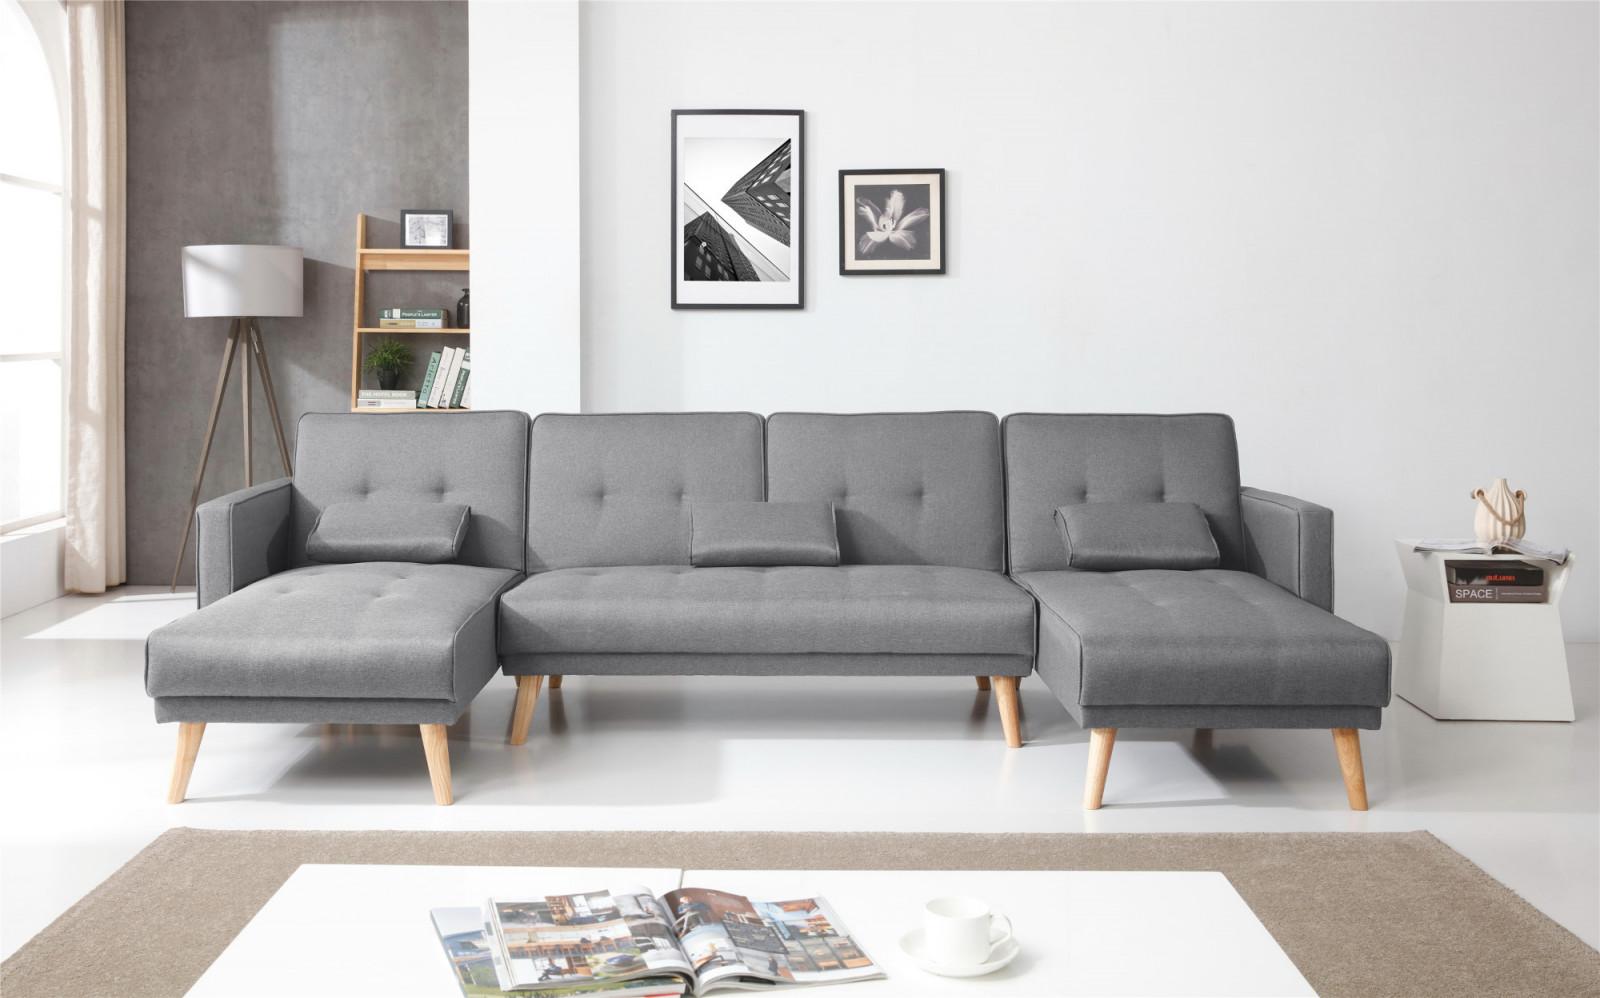 ecksofa gallery of selsey ecksofa eckcouch kopenhagen in grau mit federkern bettkasten hocker. Black Bedroom Furniture Sets. Home Design Ideas